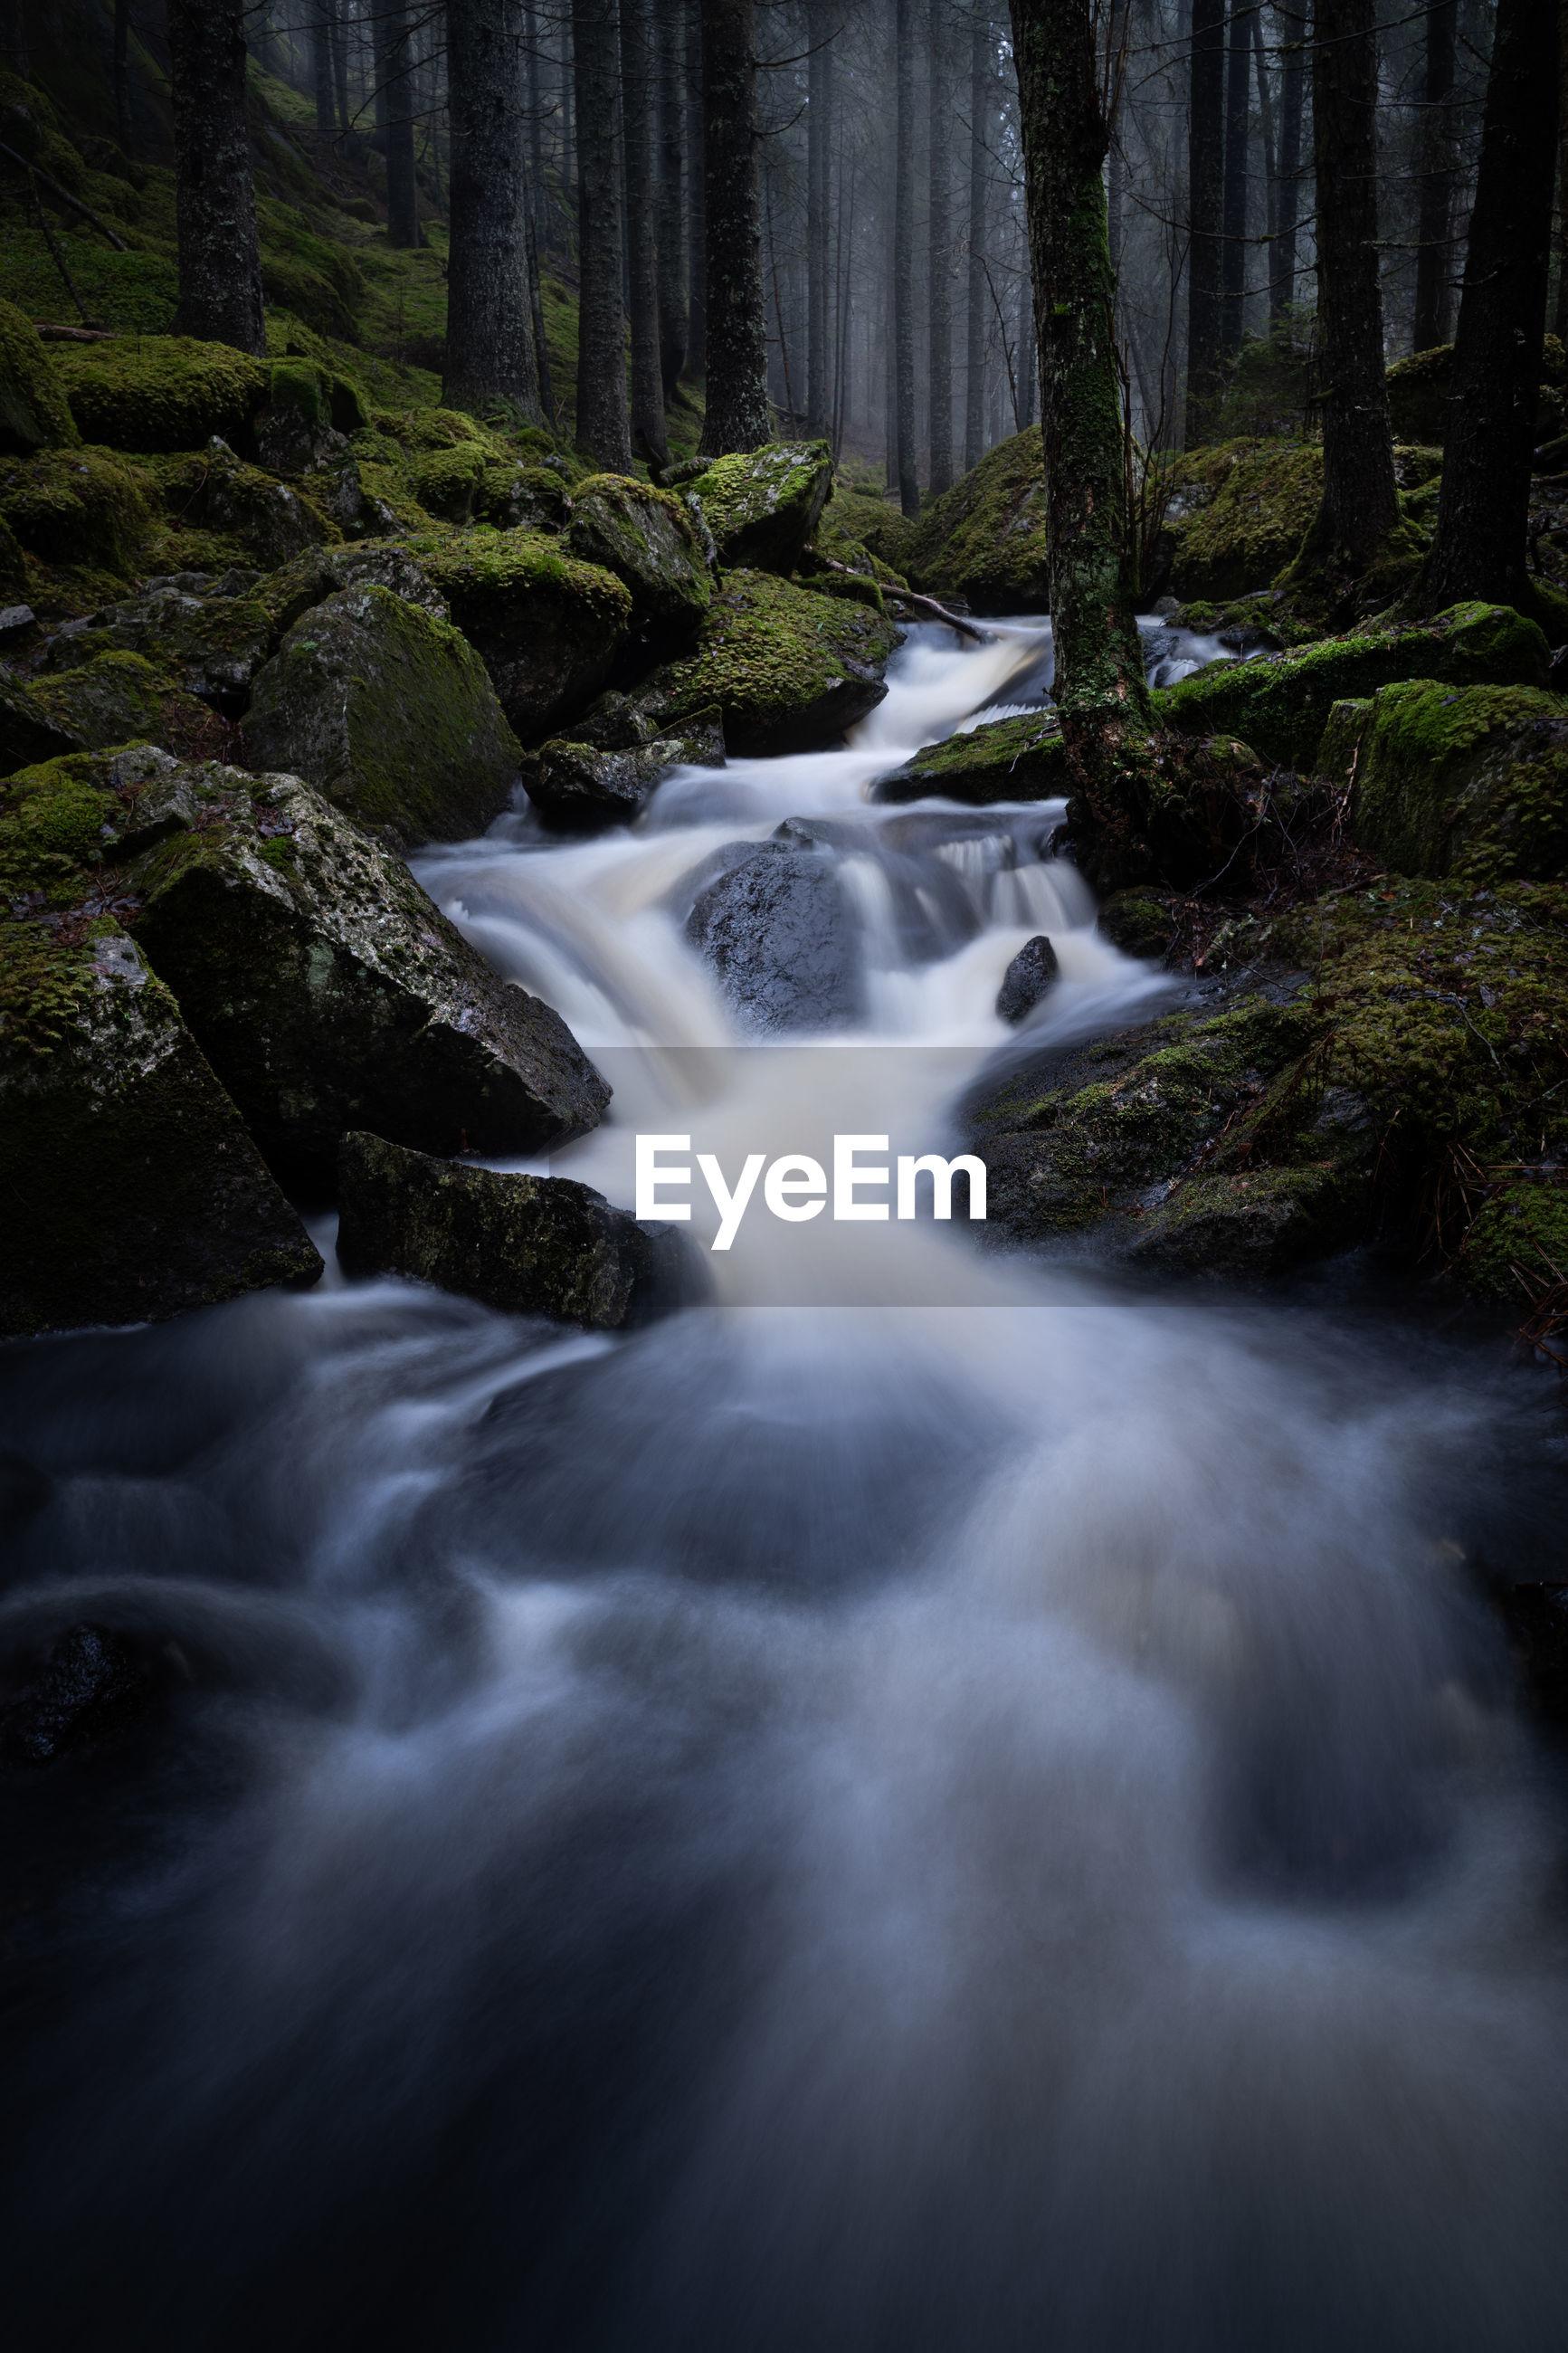 Creek flowing between moss-grown rocks through a moody forest